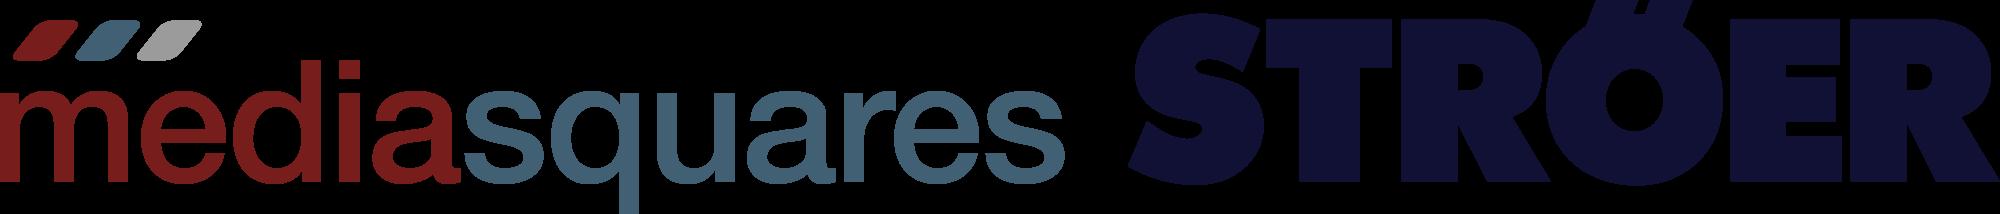 Logo mediasquares Ströer